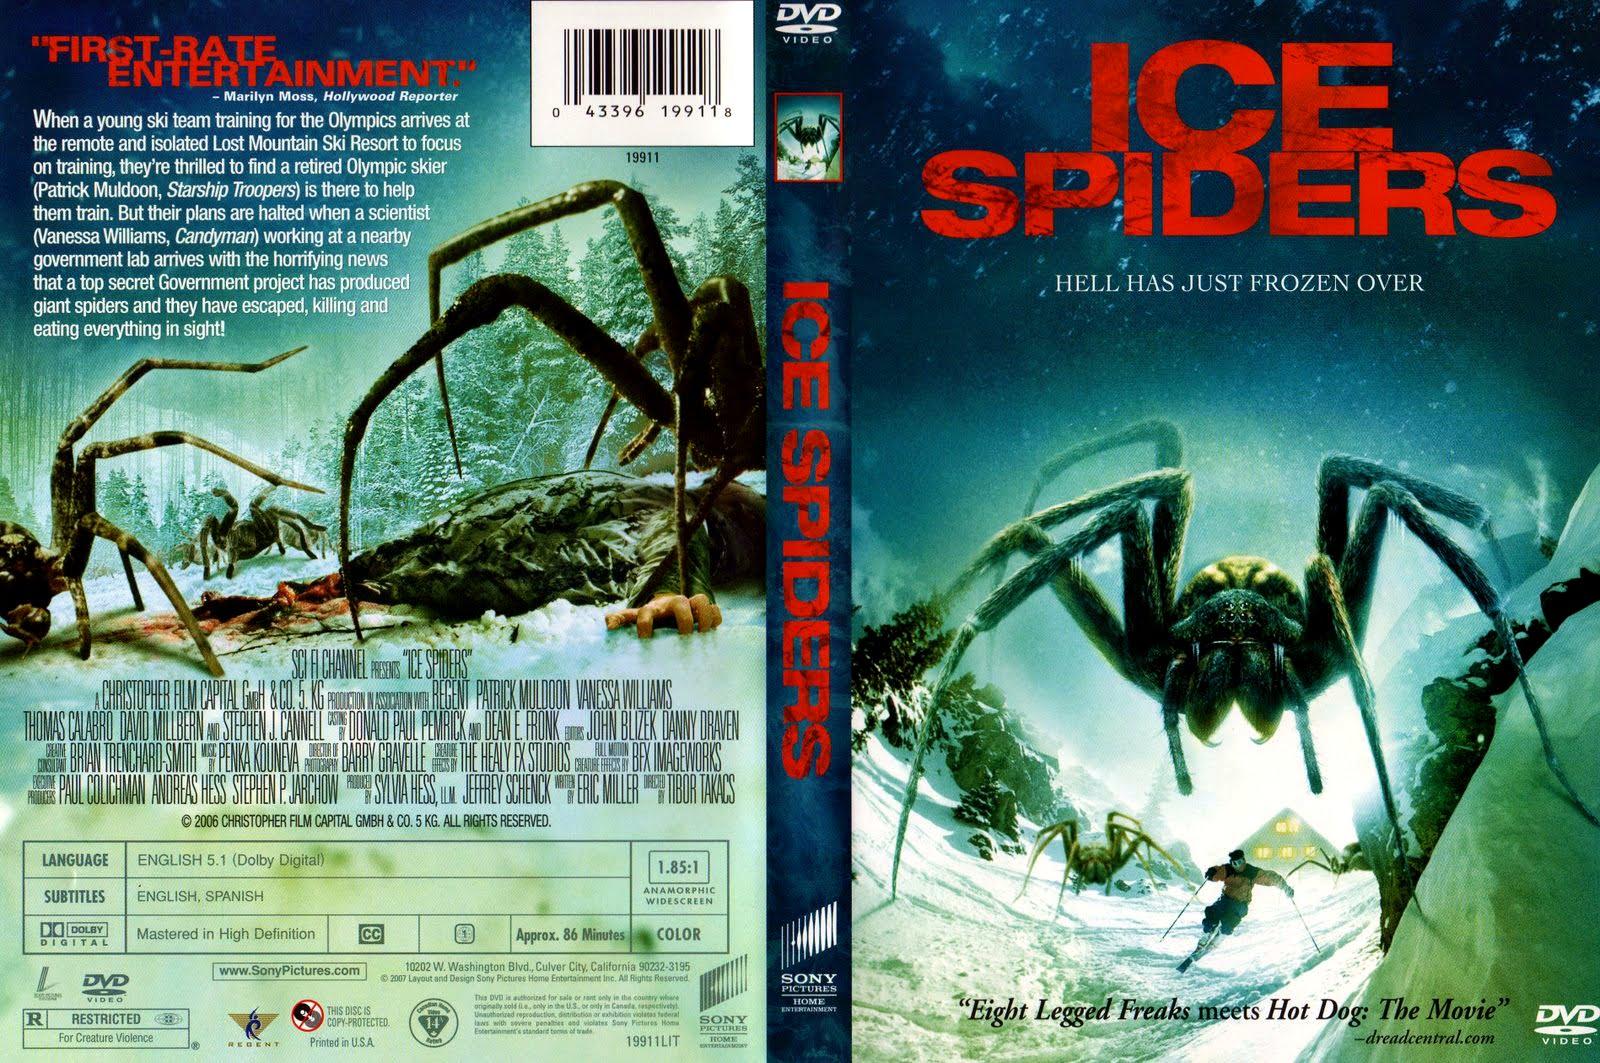 http://4.bp.blogspot.com/_Kf6evr1umrA/TQQsXUNcwoI/AAAAAAAAJ1g/1KhyJDq72XA/s1600/Ice_Spiders_R1-%255Bcdcovers_cc%255D-front.jpg